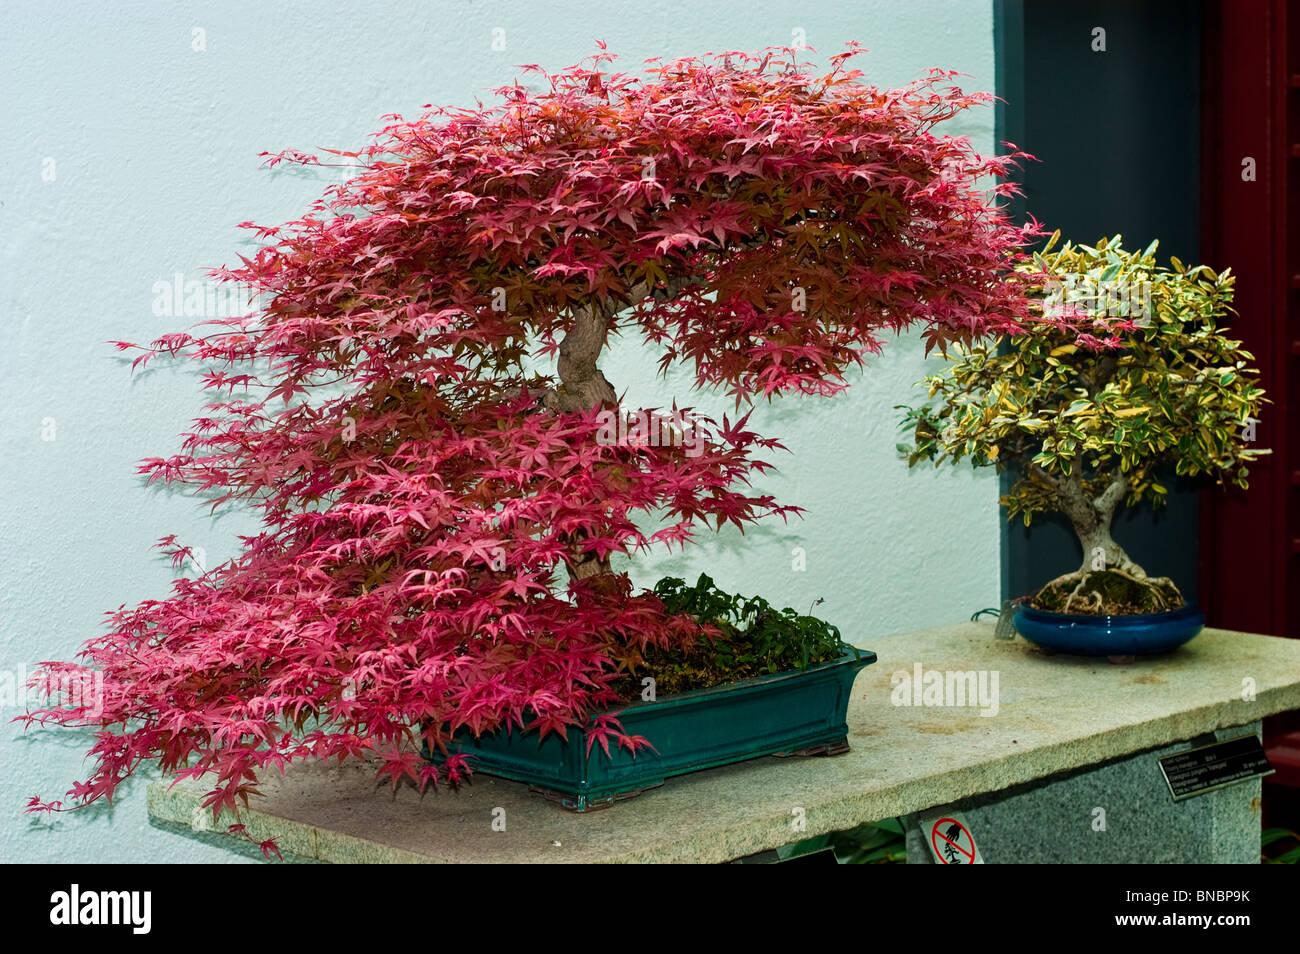 Acer Palmatum Bonsai Trees In Montreal Botanic Garden Greenhouse